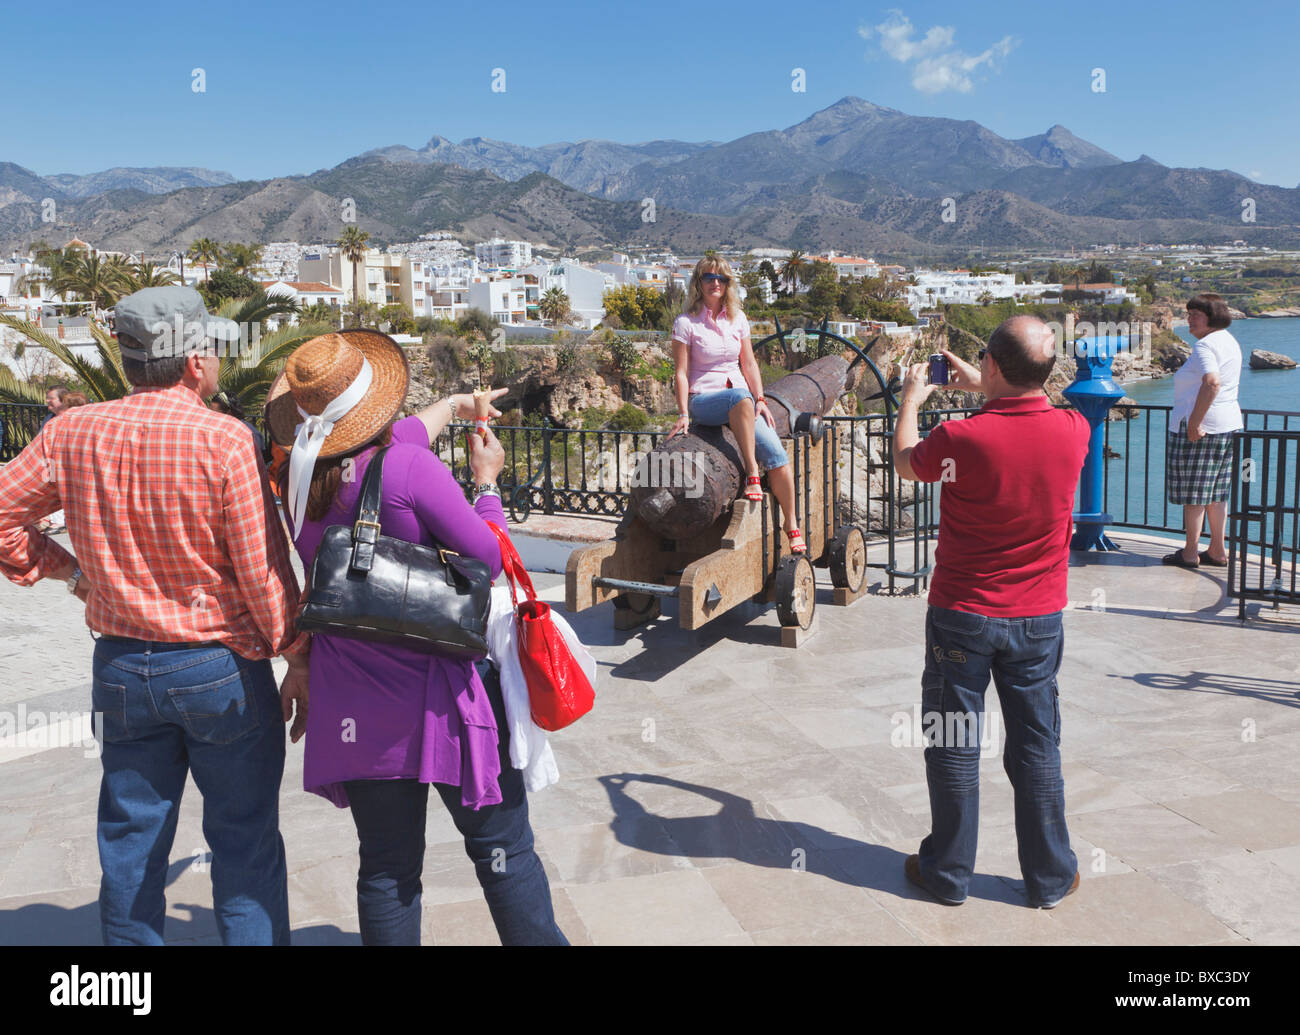 Nerja, Costa del Sol, Malaga Province, Spain. Tourists on the Balcon de Europa. Balcony of Europe. - Stock Image